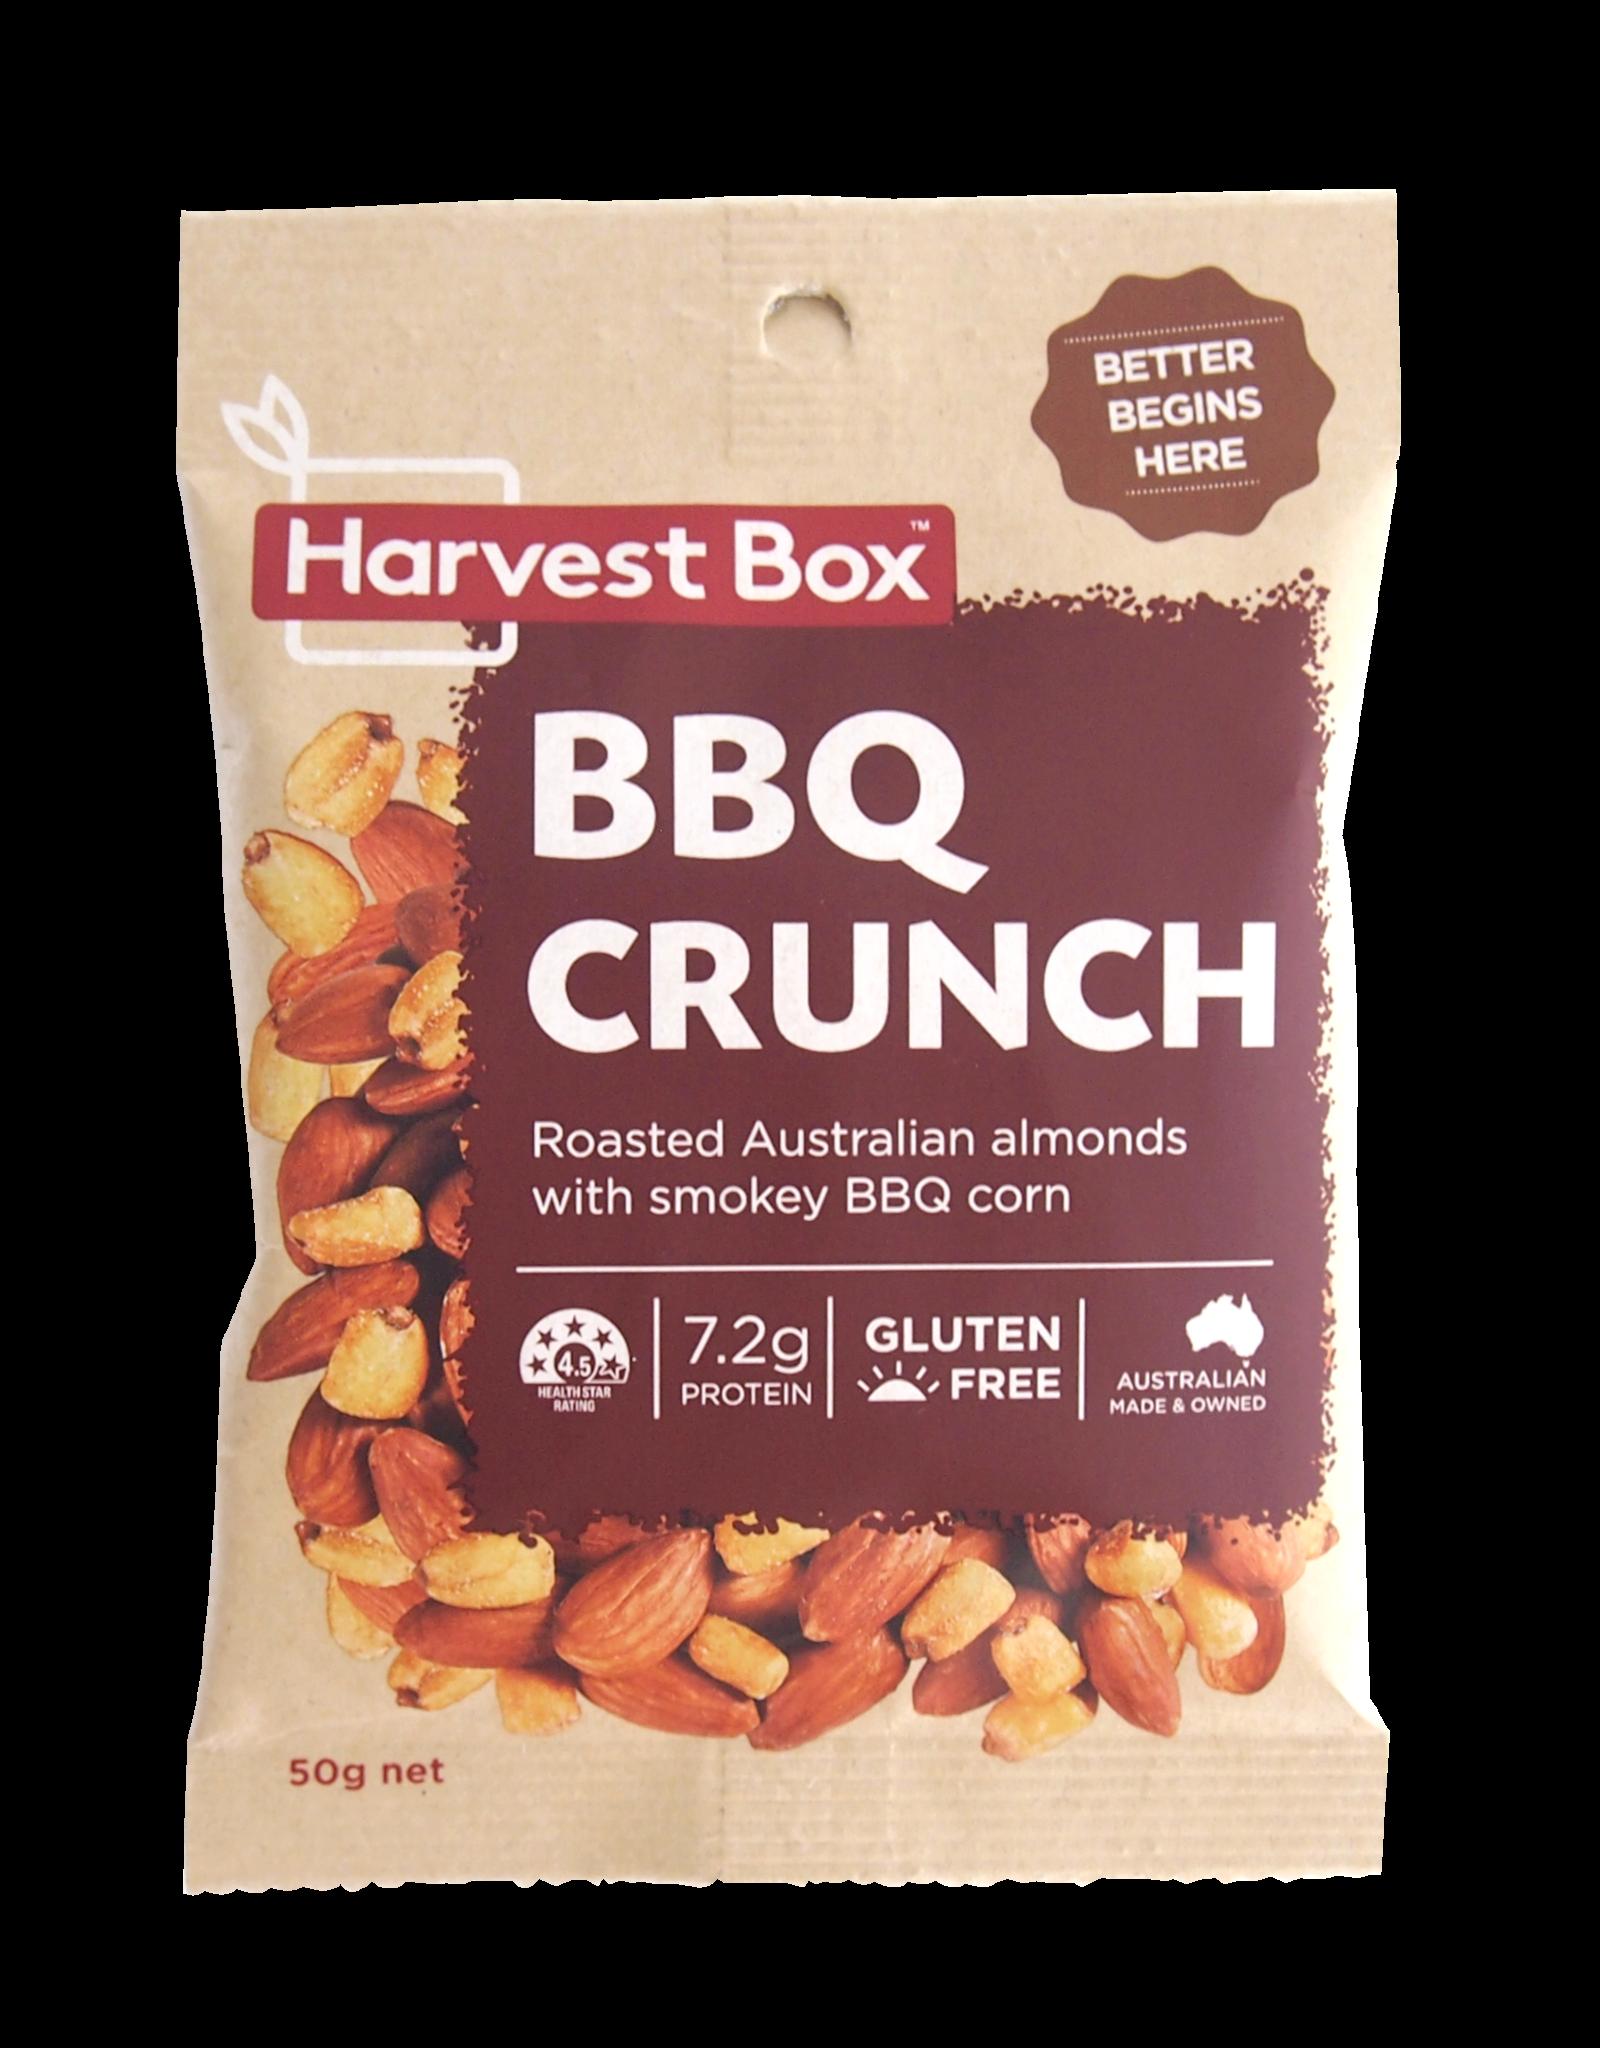 Harvest Box BBQ Crunch 50g